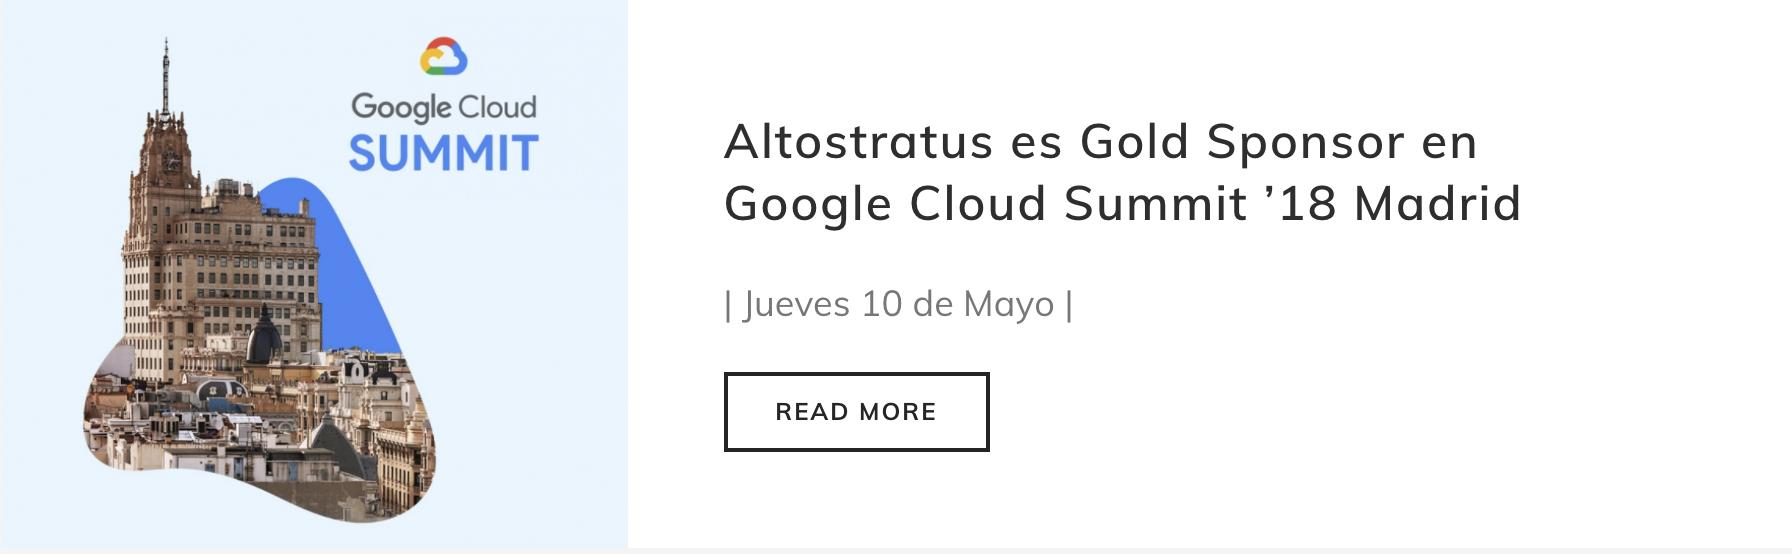 gold-sponsor-google-altostratus